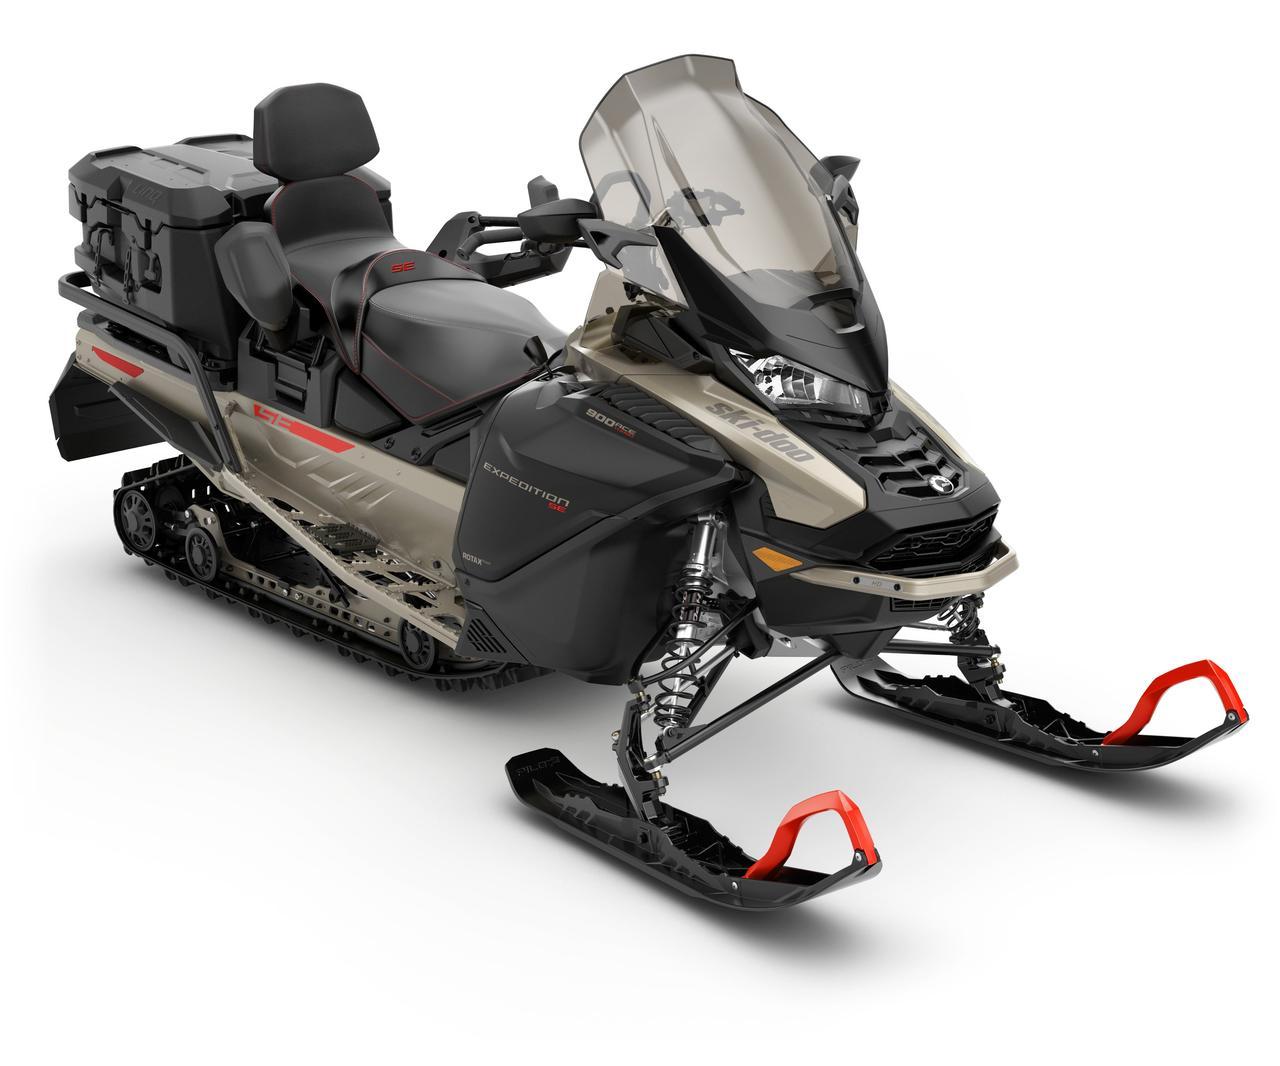 Expedition SE VIP 900 ACE Turbo Жидкий титаниум с черным 2022